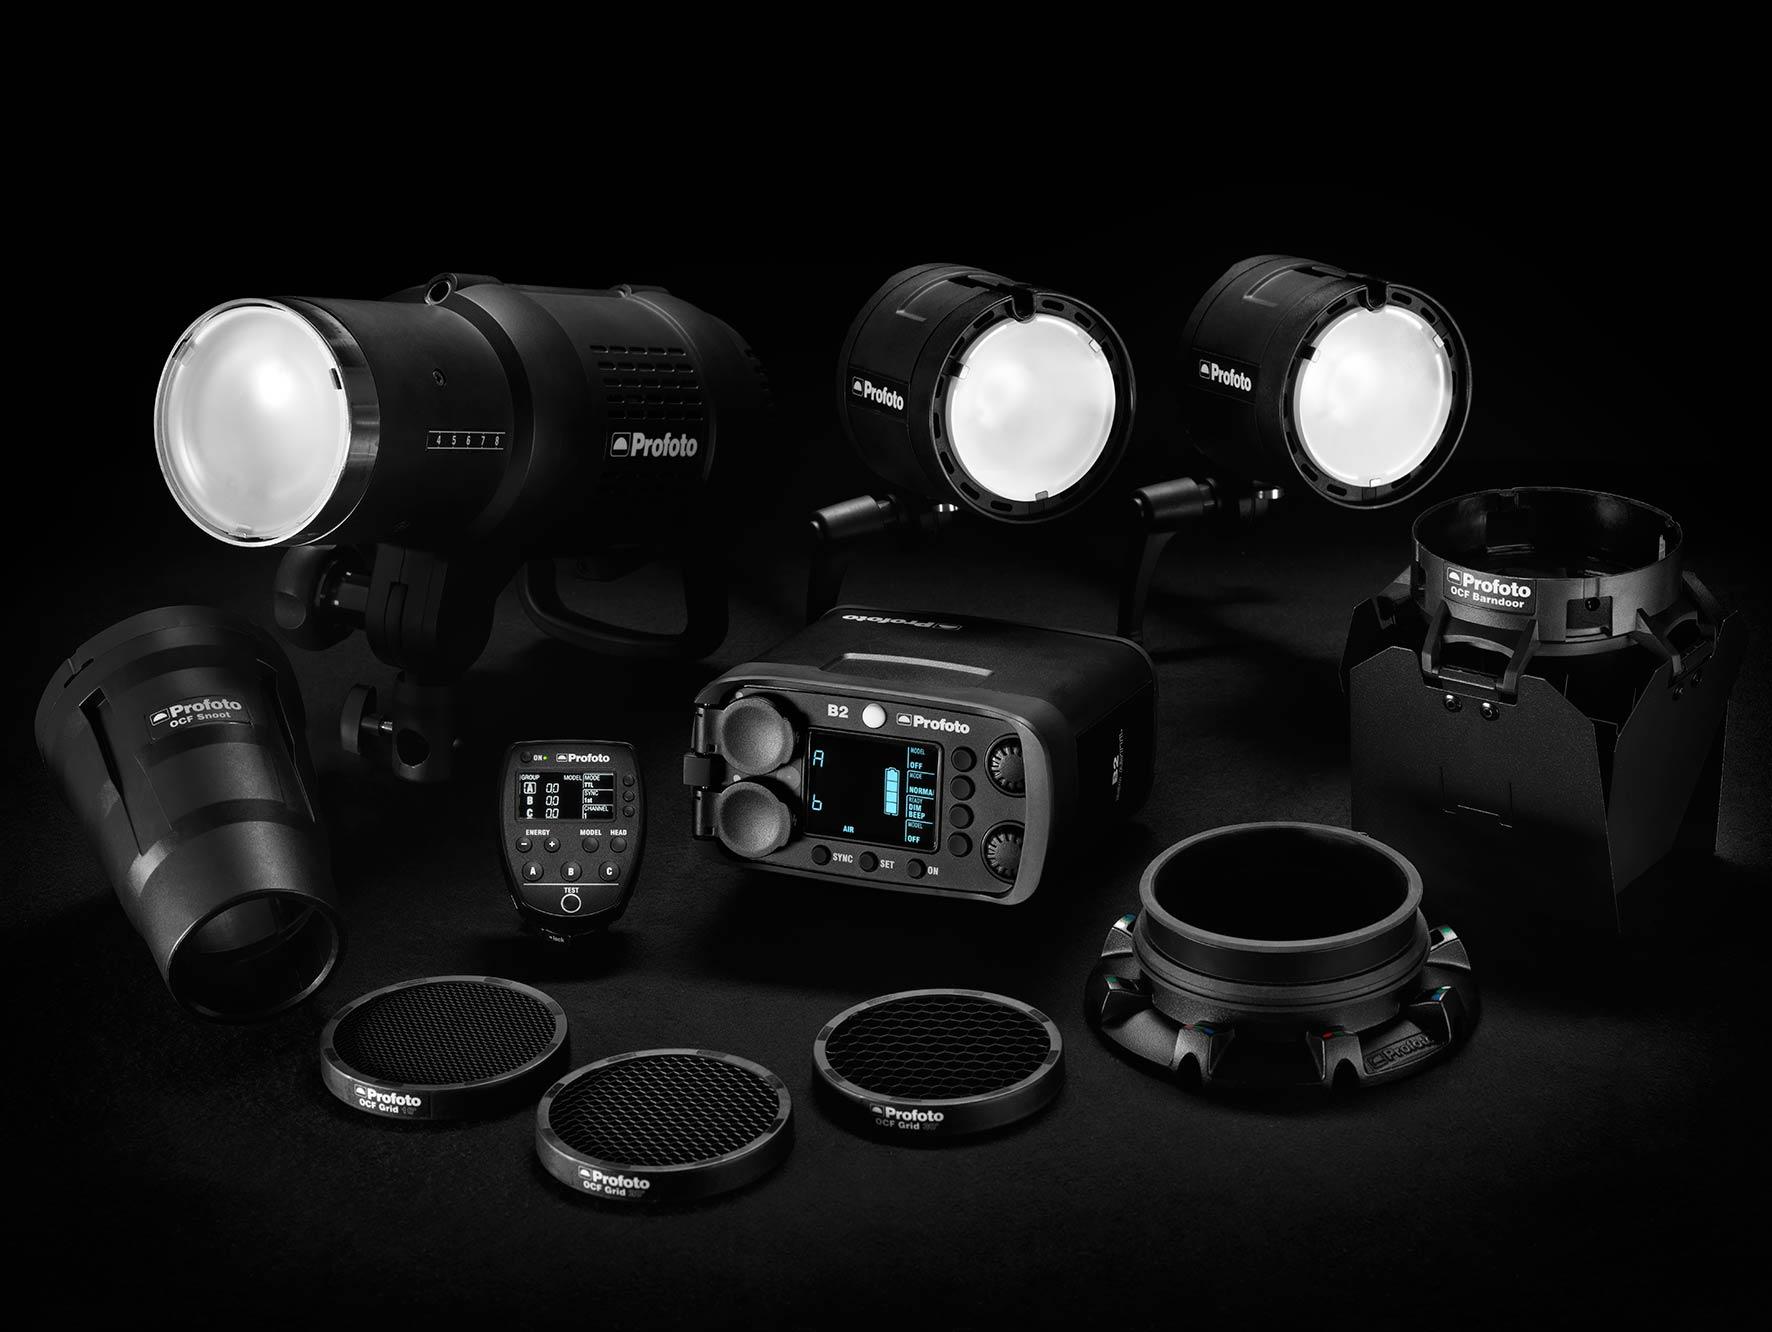 Profoto - Off-Camera & On-Camera Flash System